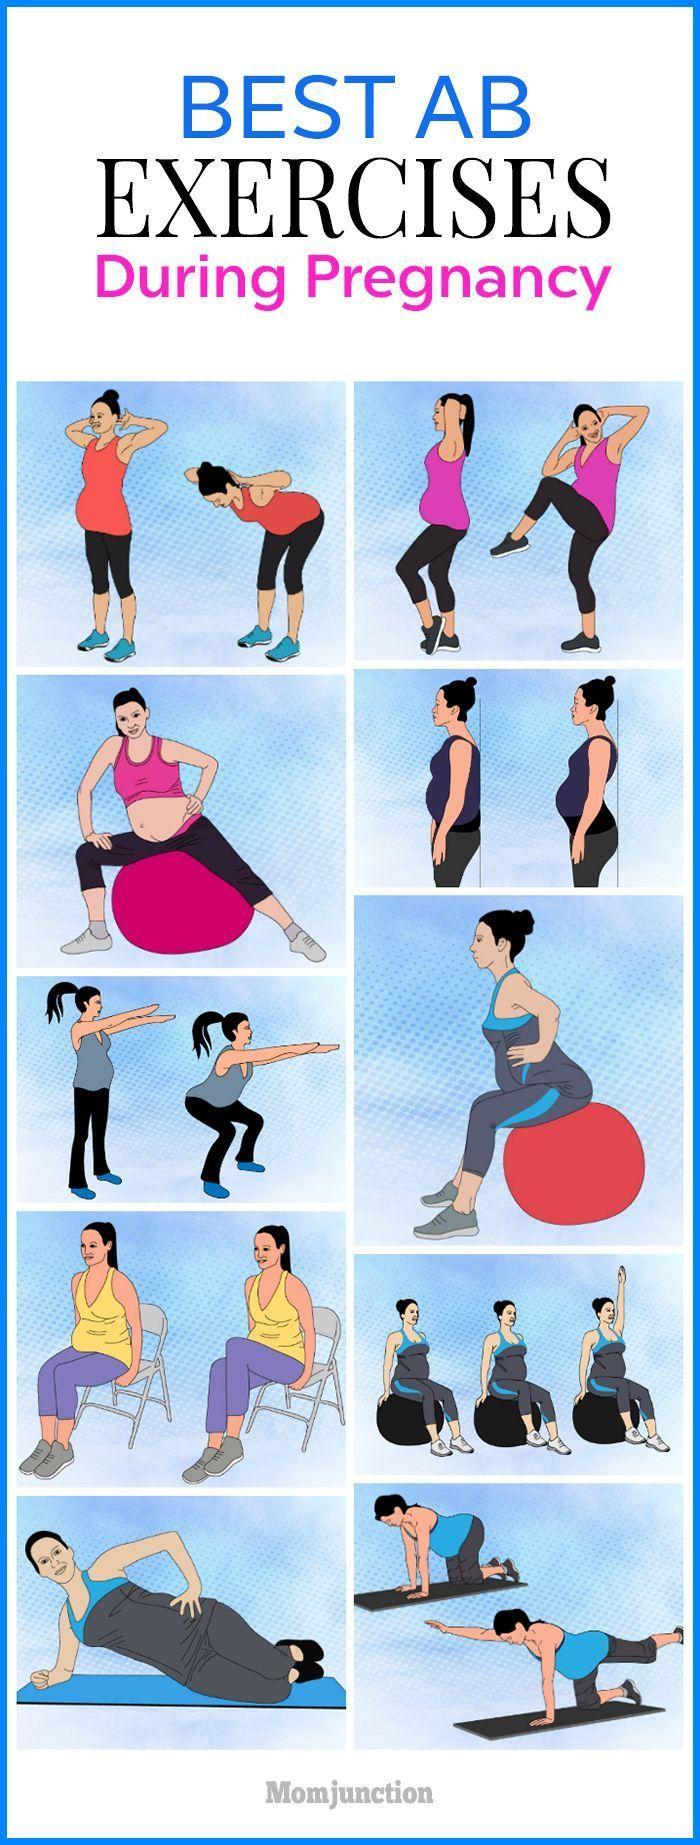 2892 best Pregnancy Care images on Pinterest